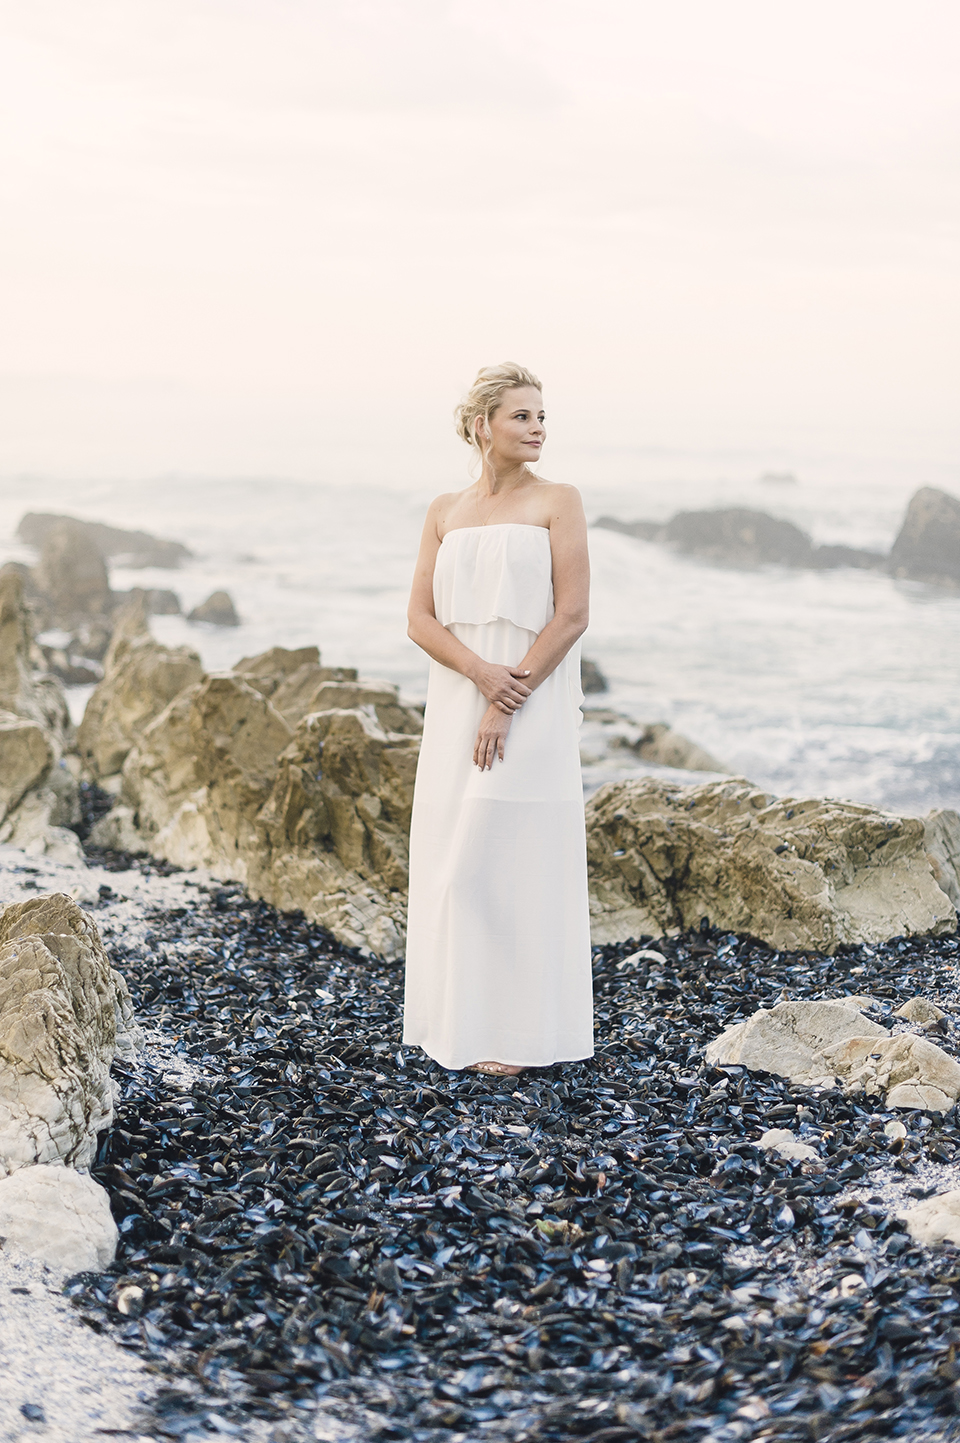 RyanParker_CapeTown_Photographer_Wedding_Hermanus_A&B_DSC_9145.jpg